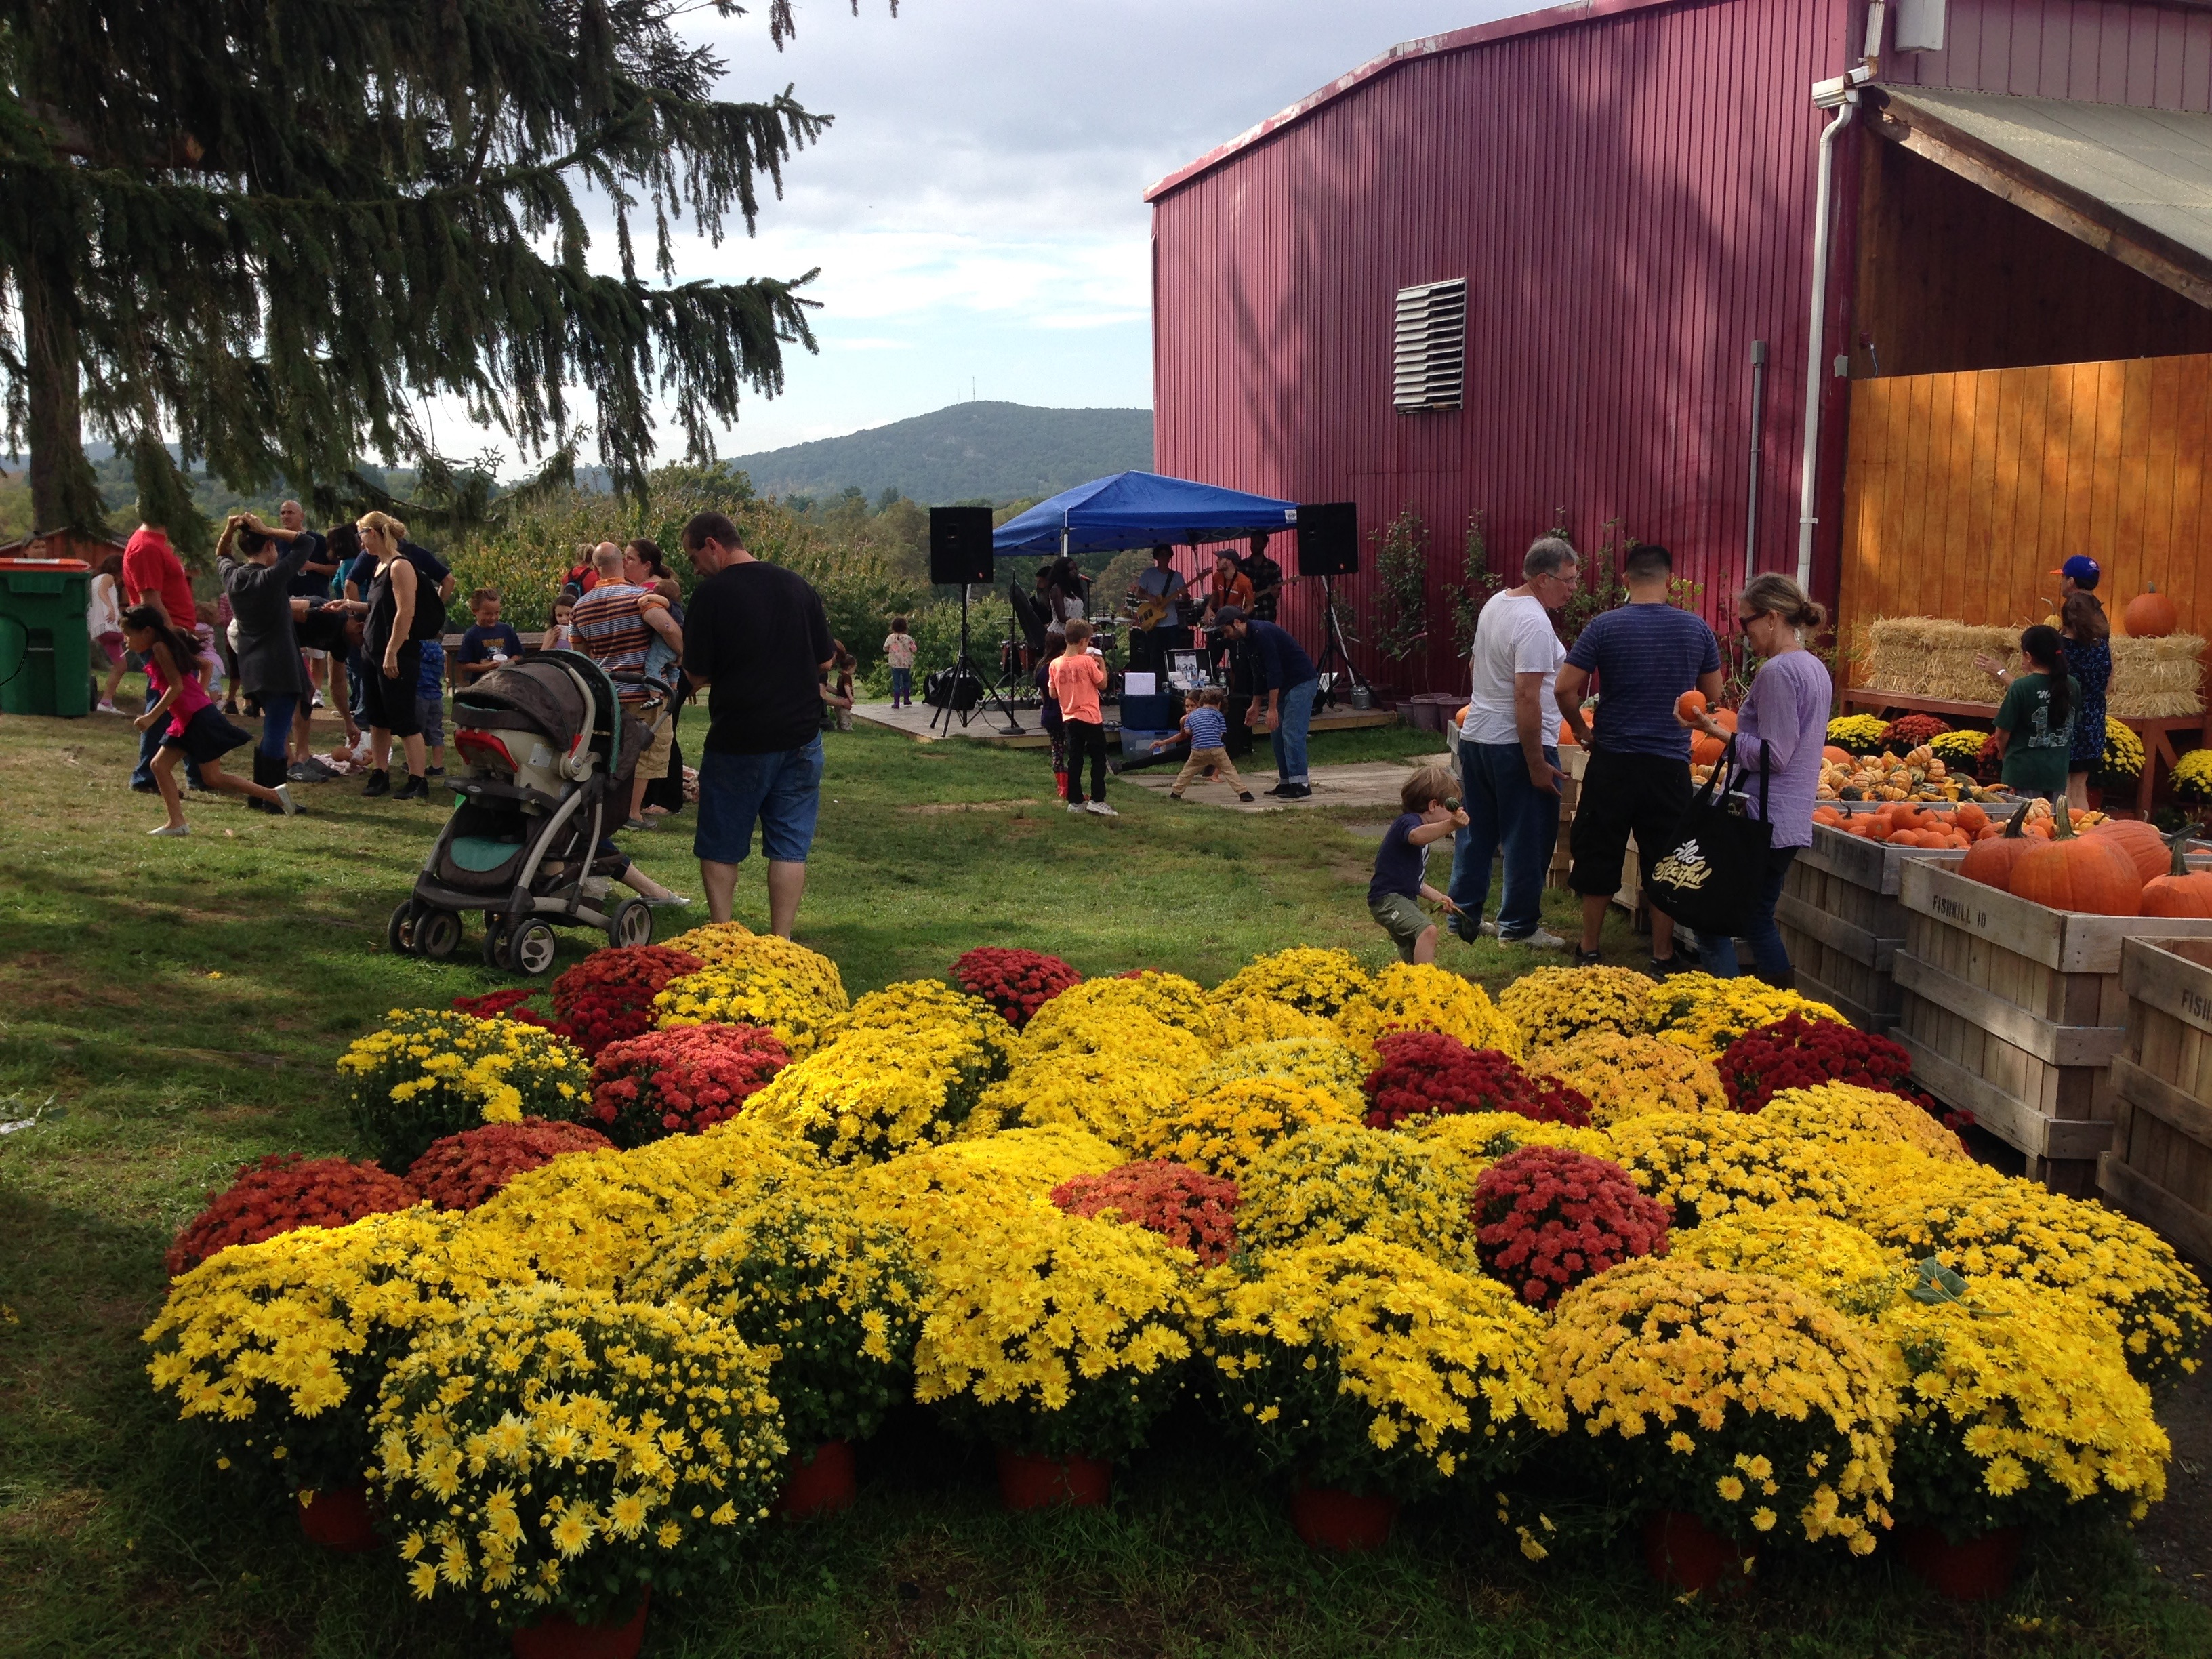 Farm Festivalsimage